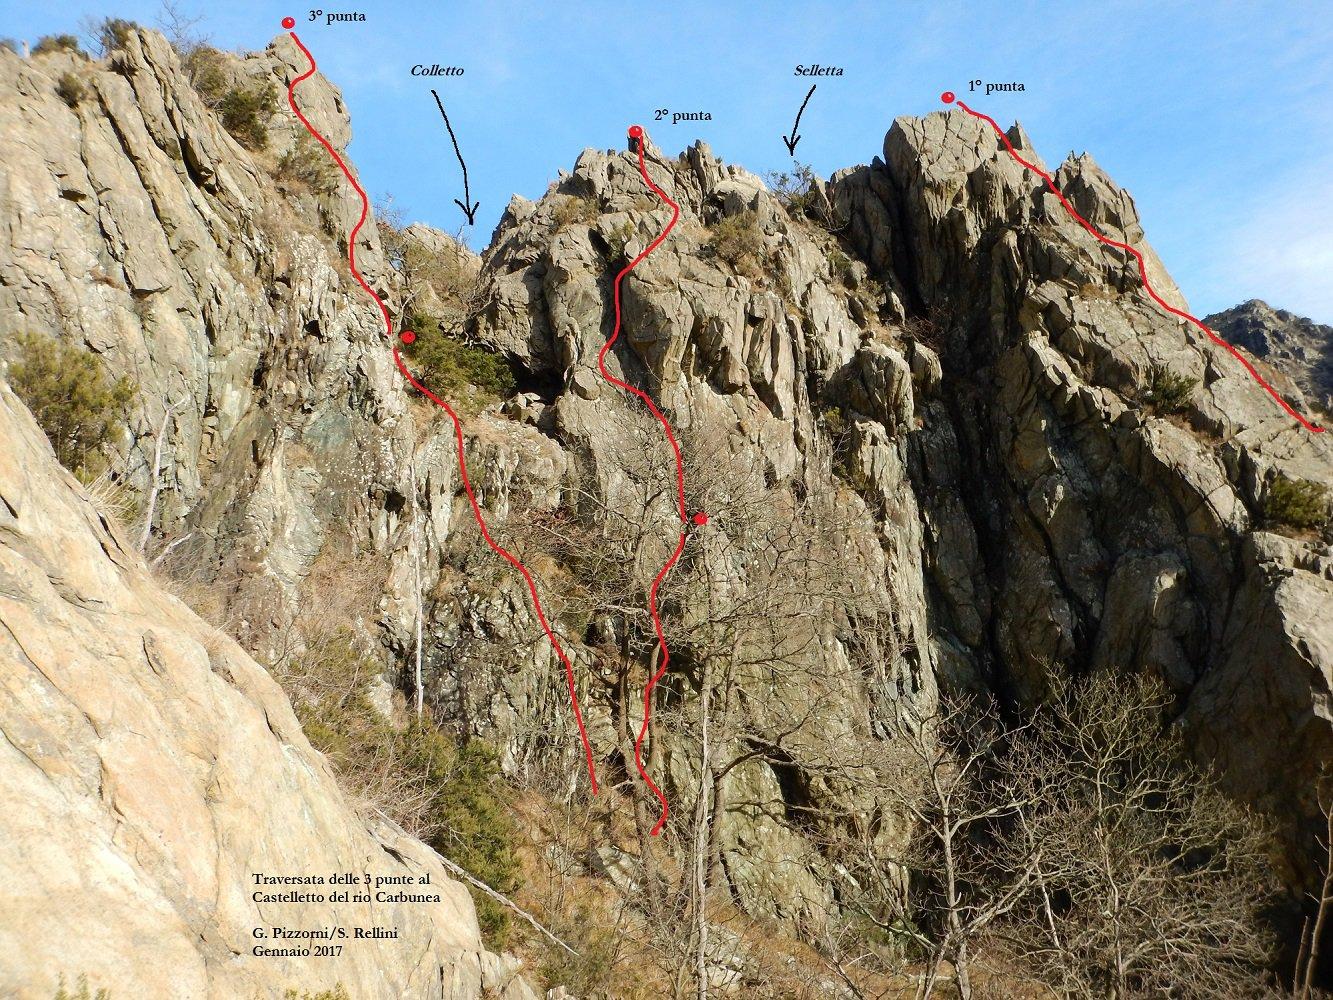 Rama (Monte) Traversata delle 3 punte (versante SO al Castelletto del Rio Carbunea) 2017-01-21